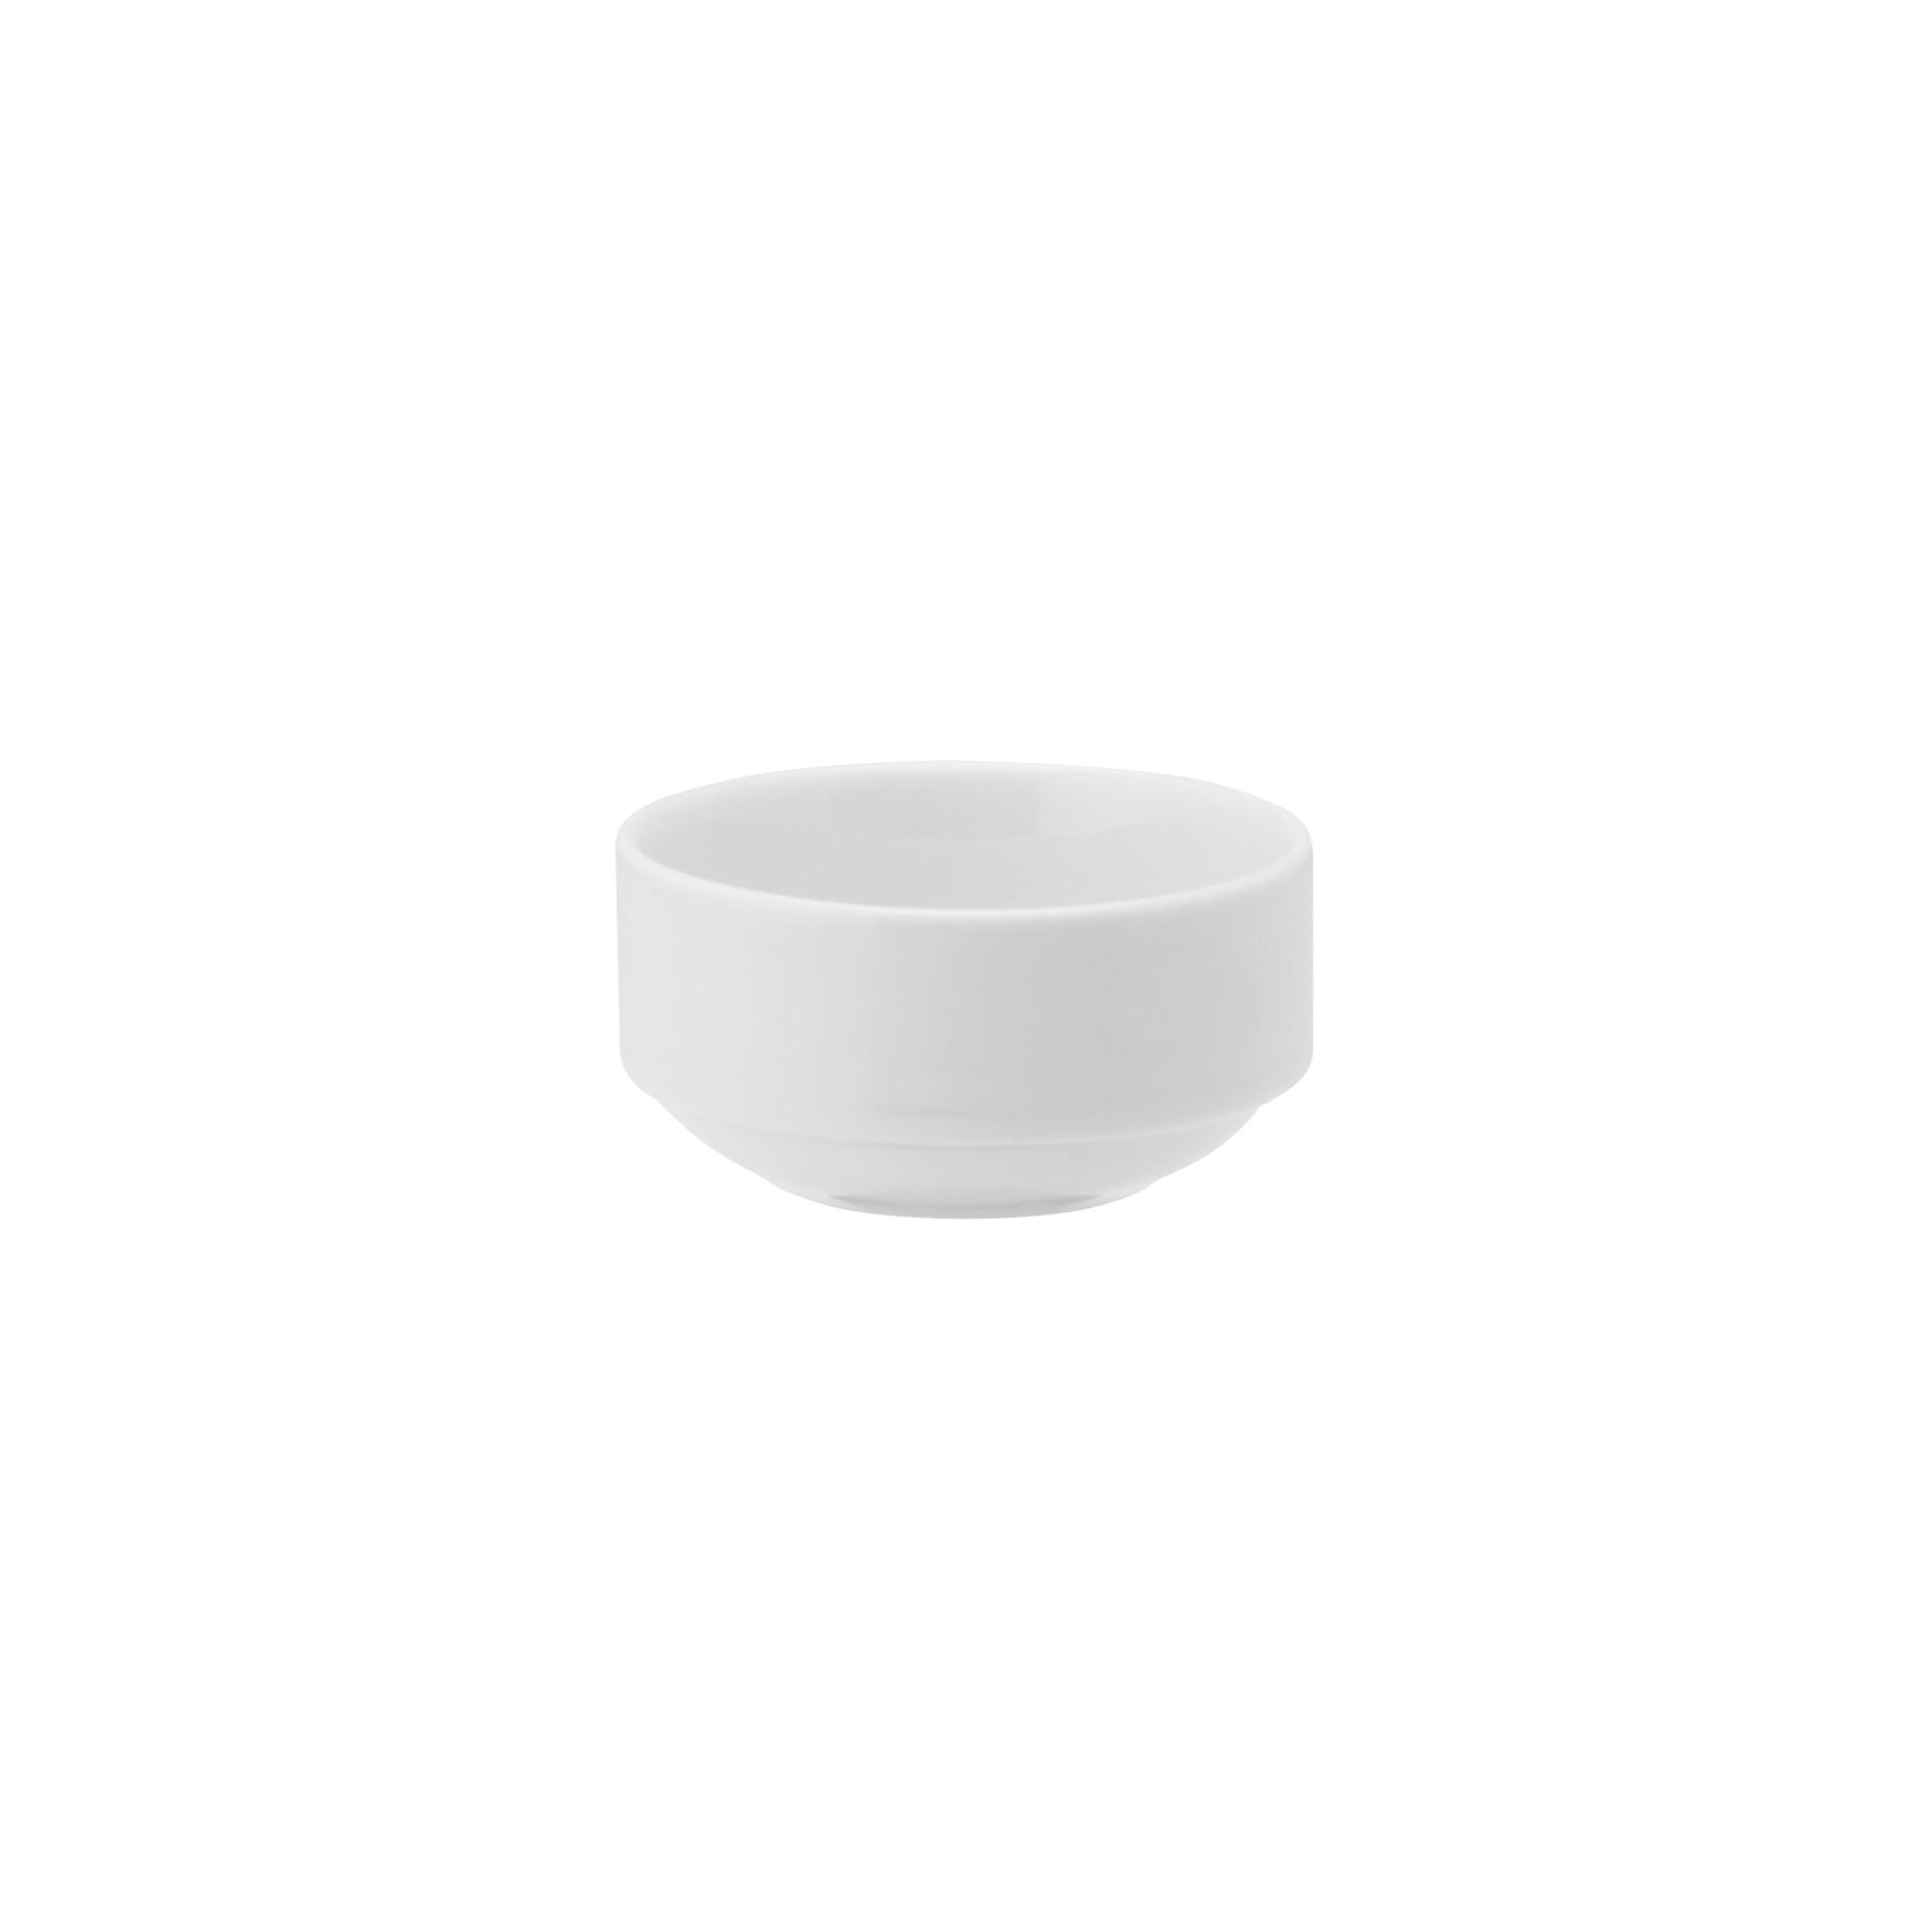 Tigela de Porcelana Redonda 115cm Branca - Schmidt